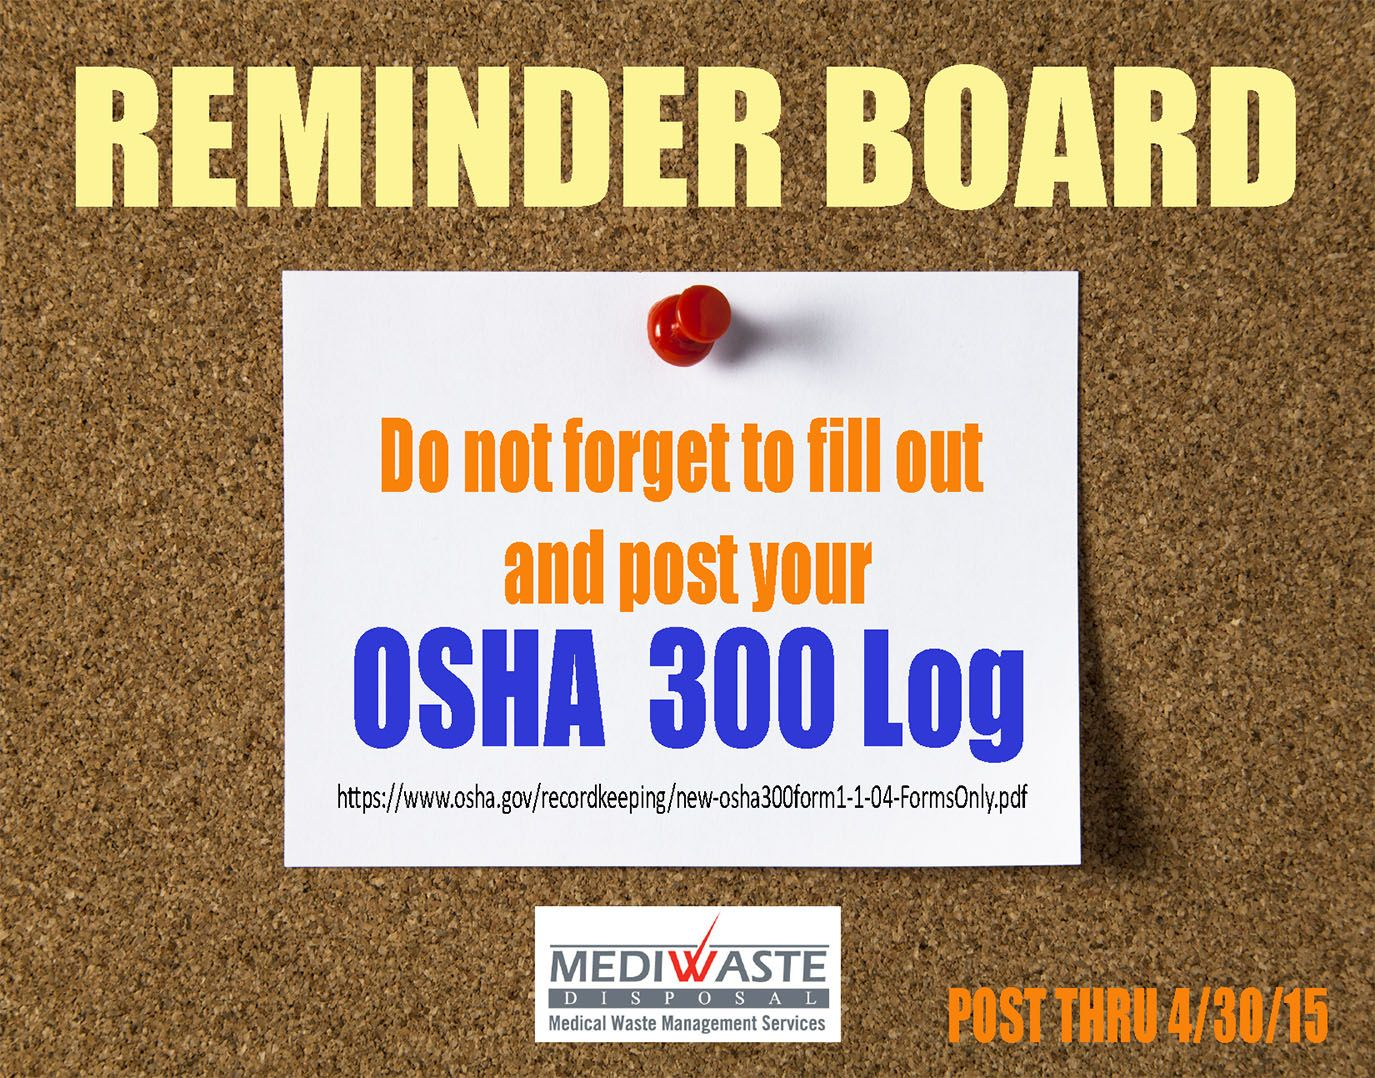 OSHA 300 Log Requirement Reminder Reminder board, Waste